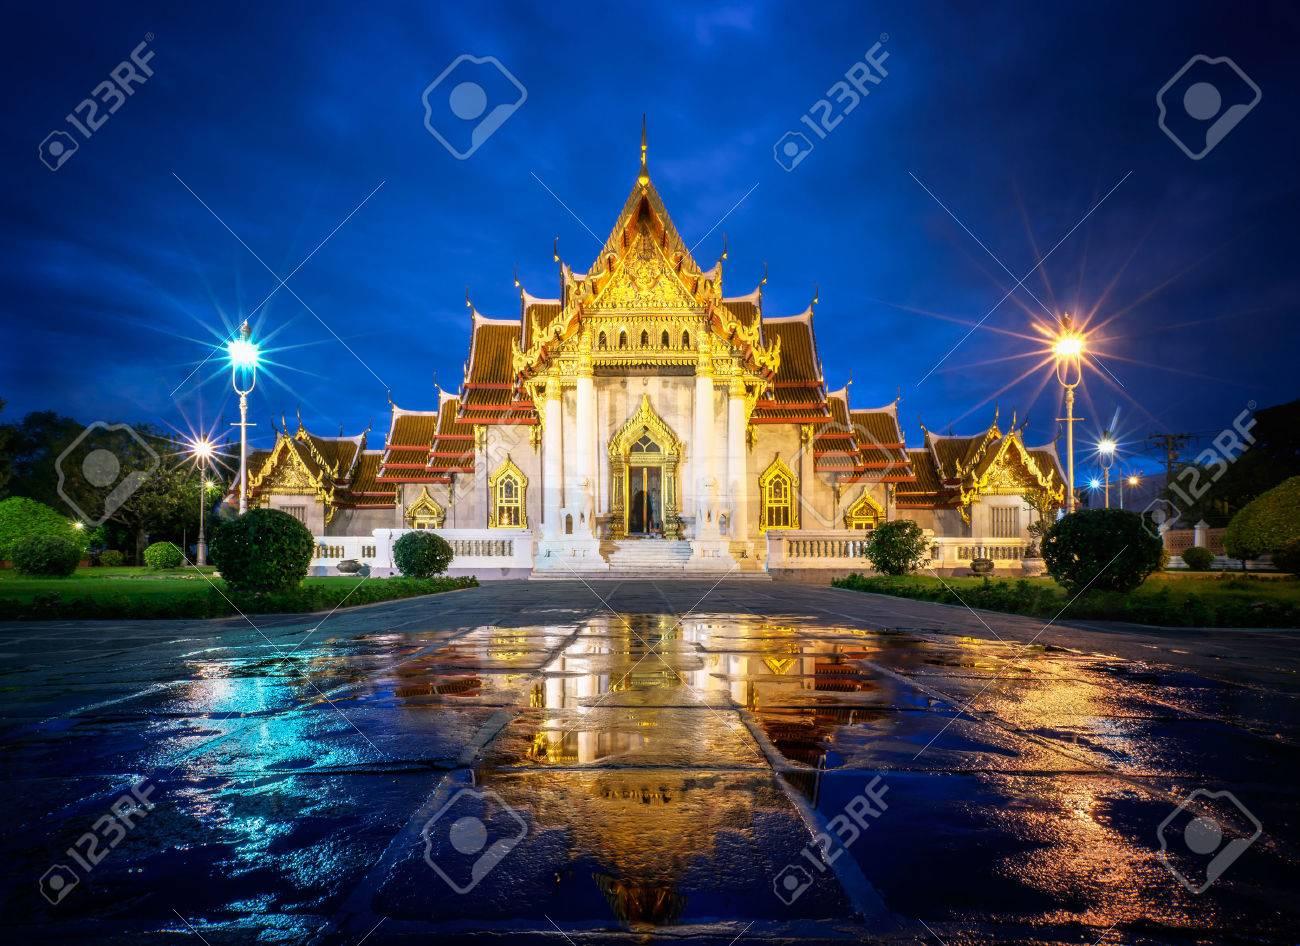 Wat Benjamaborphit or Marble Temple at twilight in Bangkok, Thai Standard-Bild - 31721436